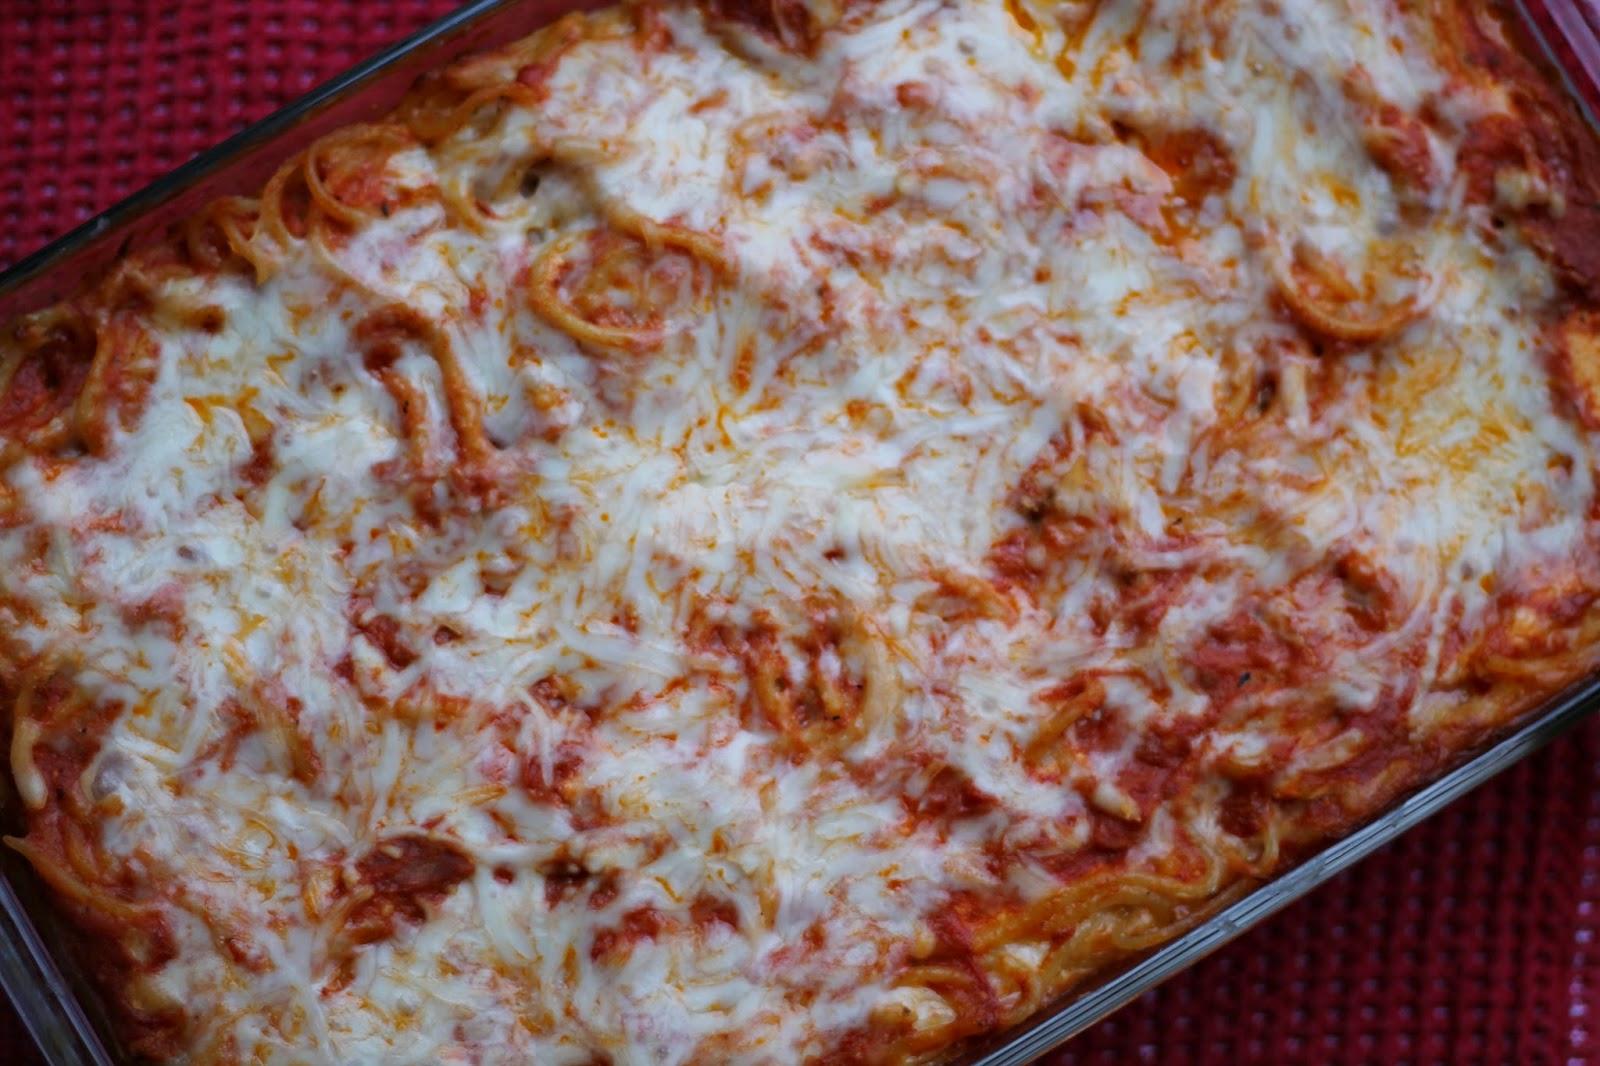 baked spaghetti in dish